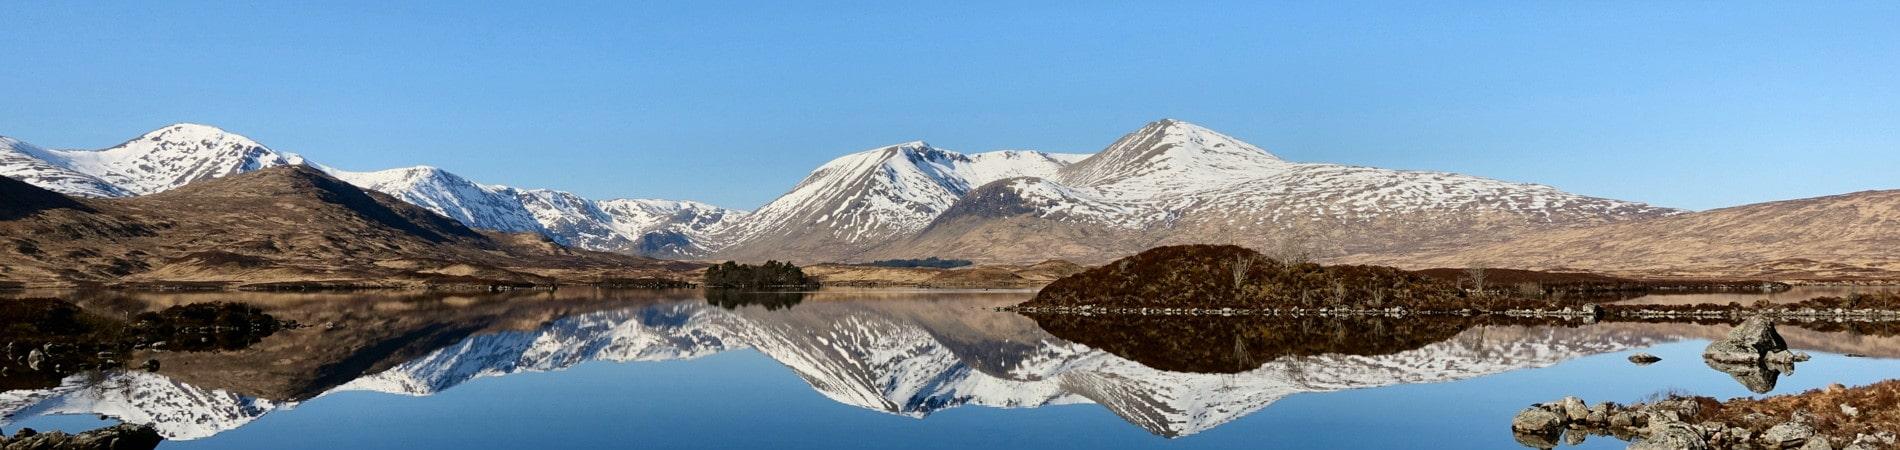 Lochs & Glens Coach Holidays to Scotland - UK Pickup points